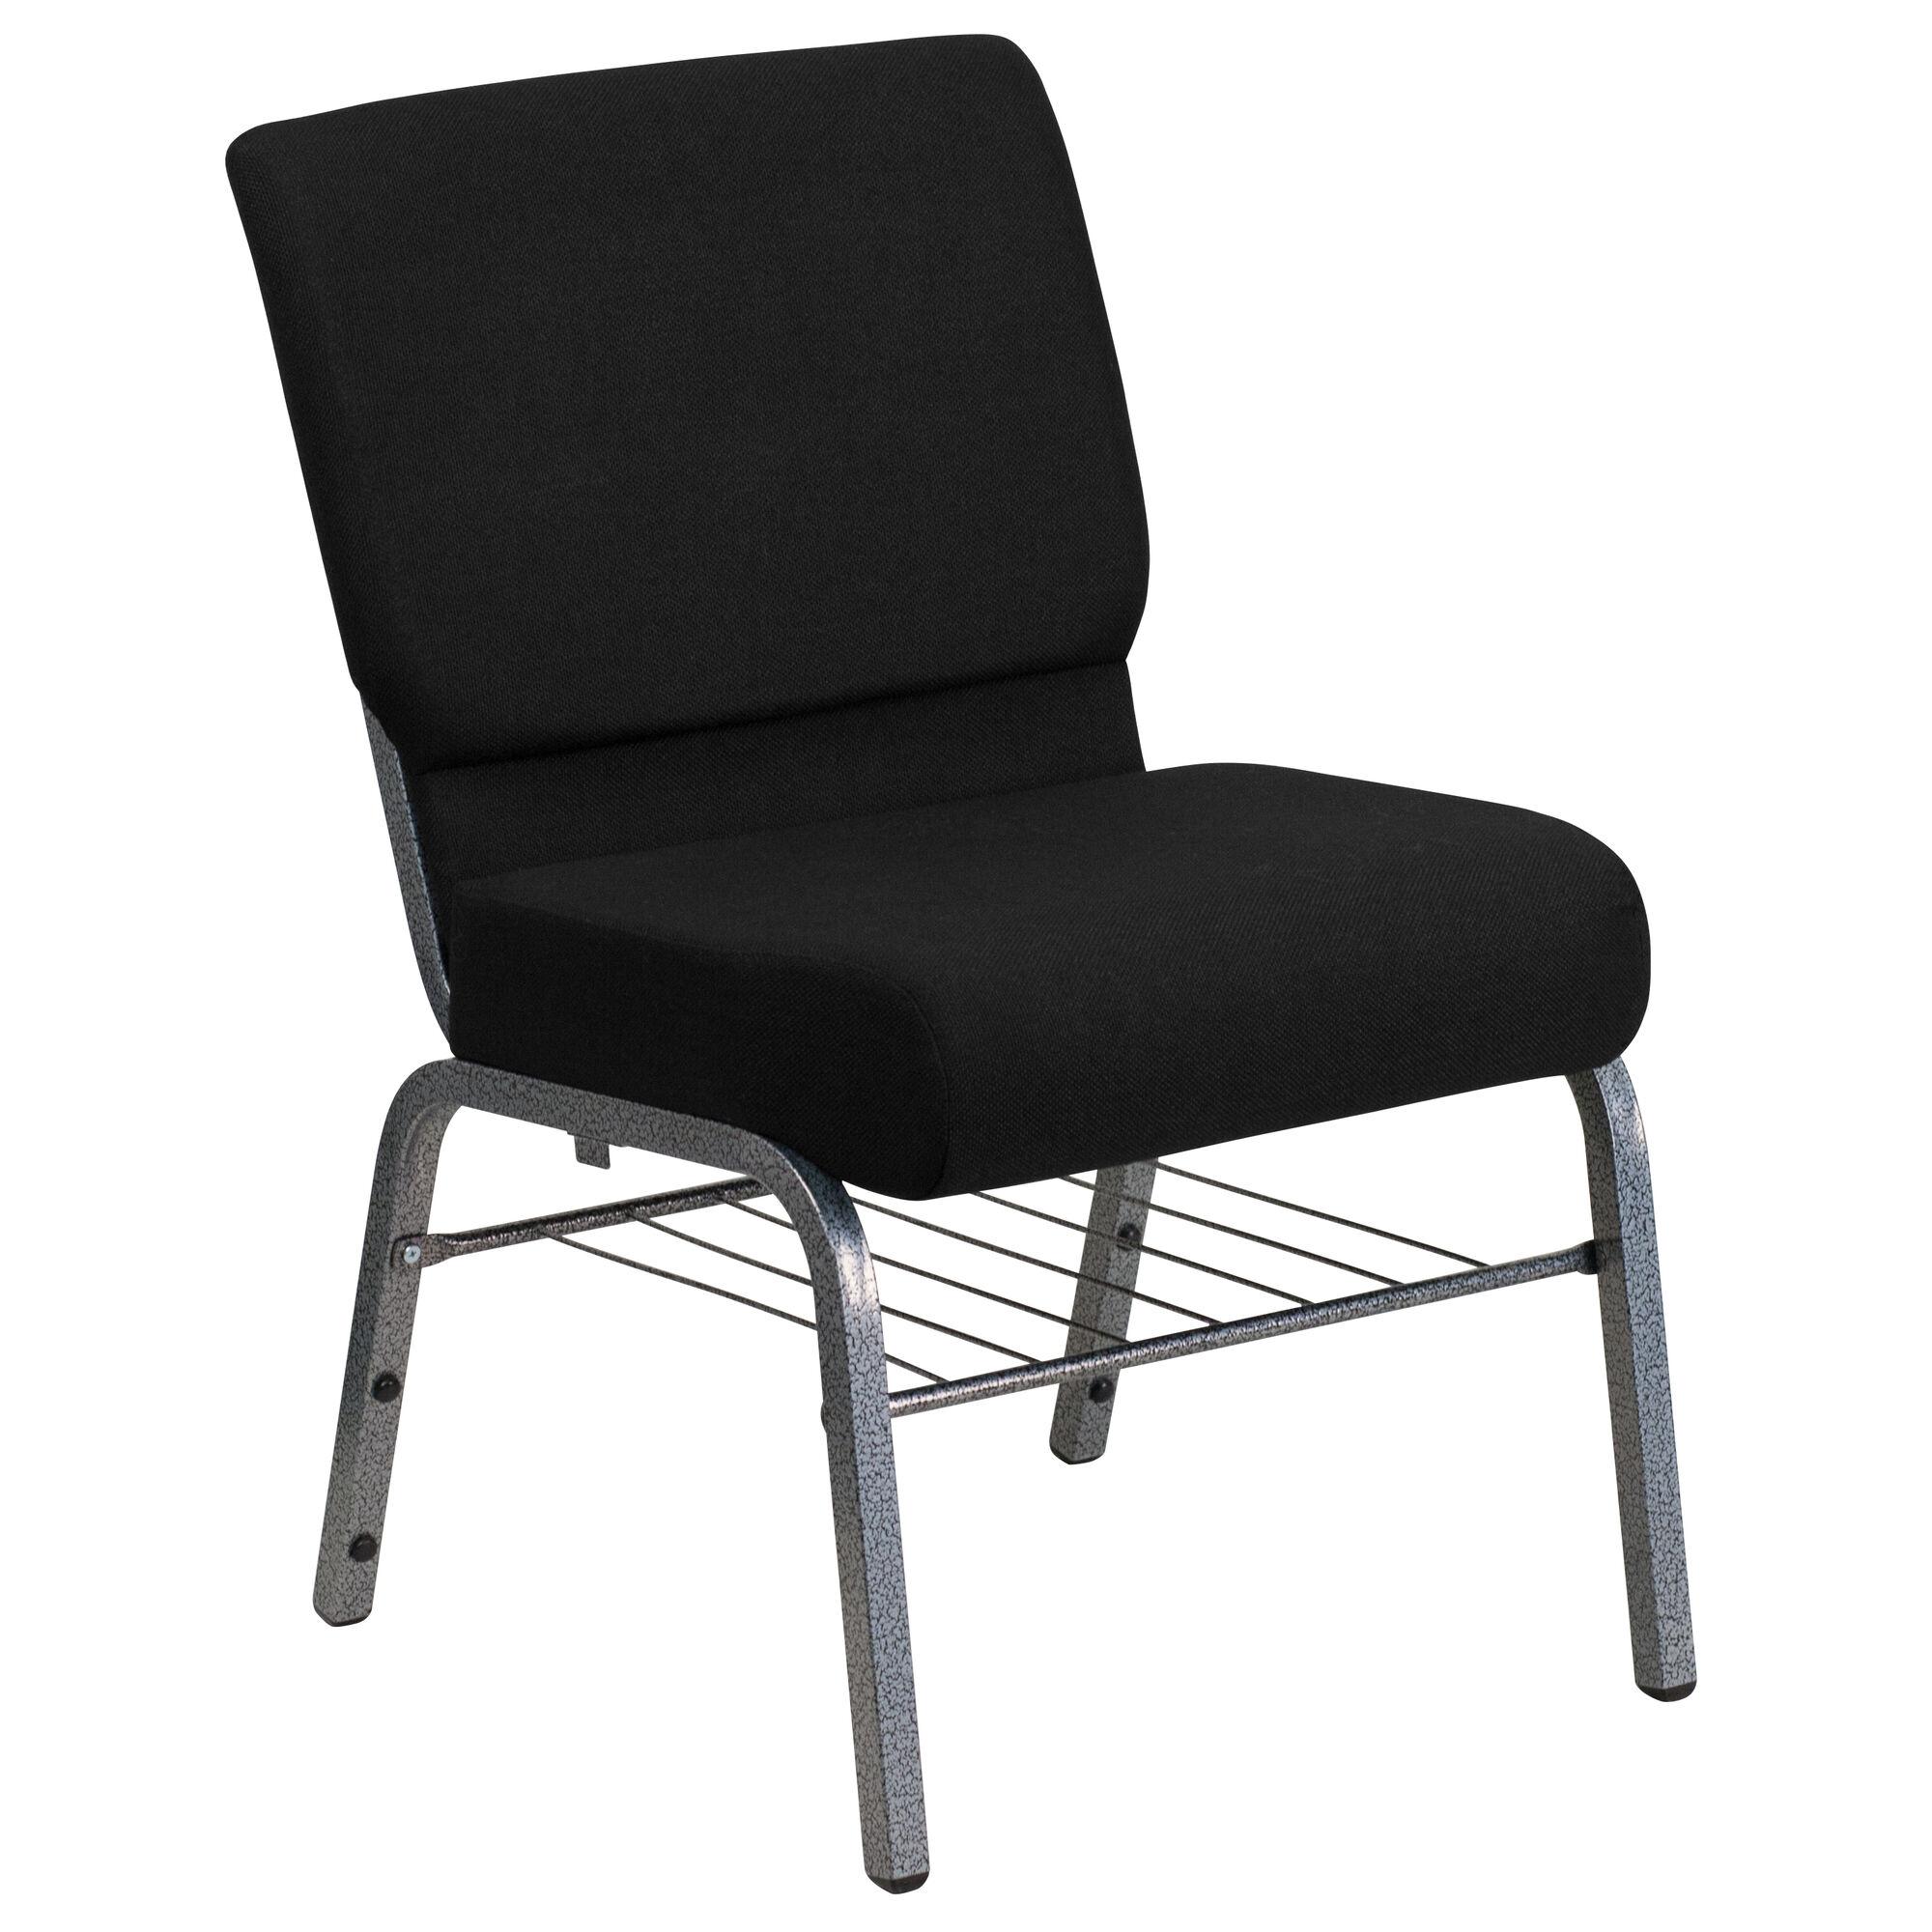 Black Fabric Church Chair XU-CH0221-BK-SV-BAS-GG